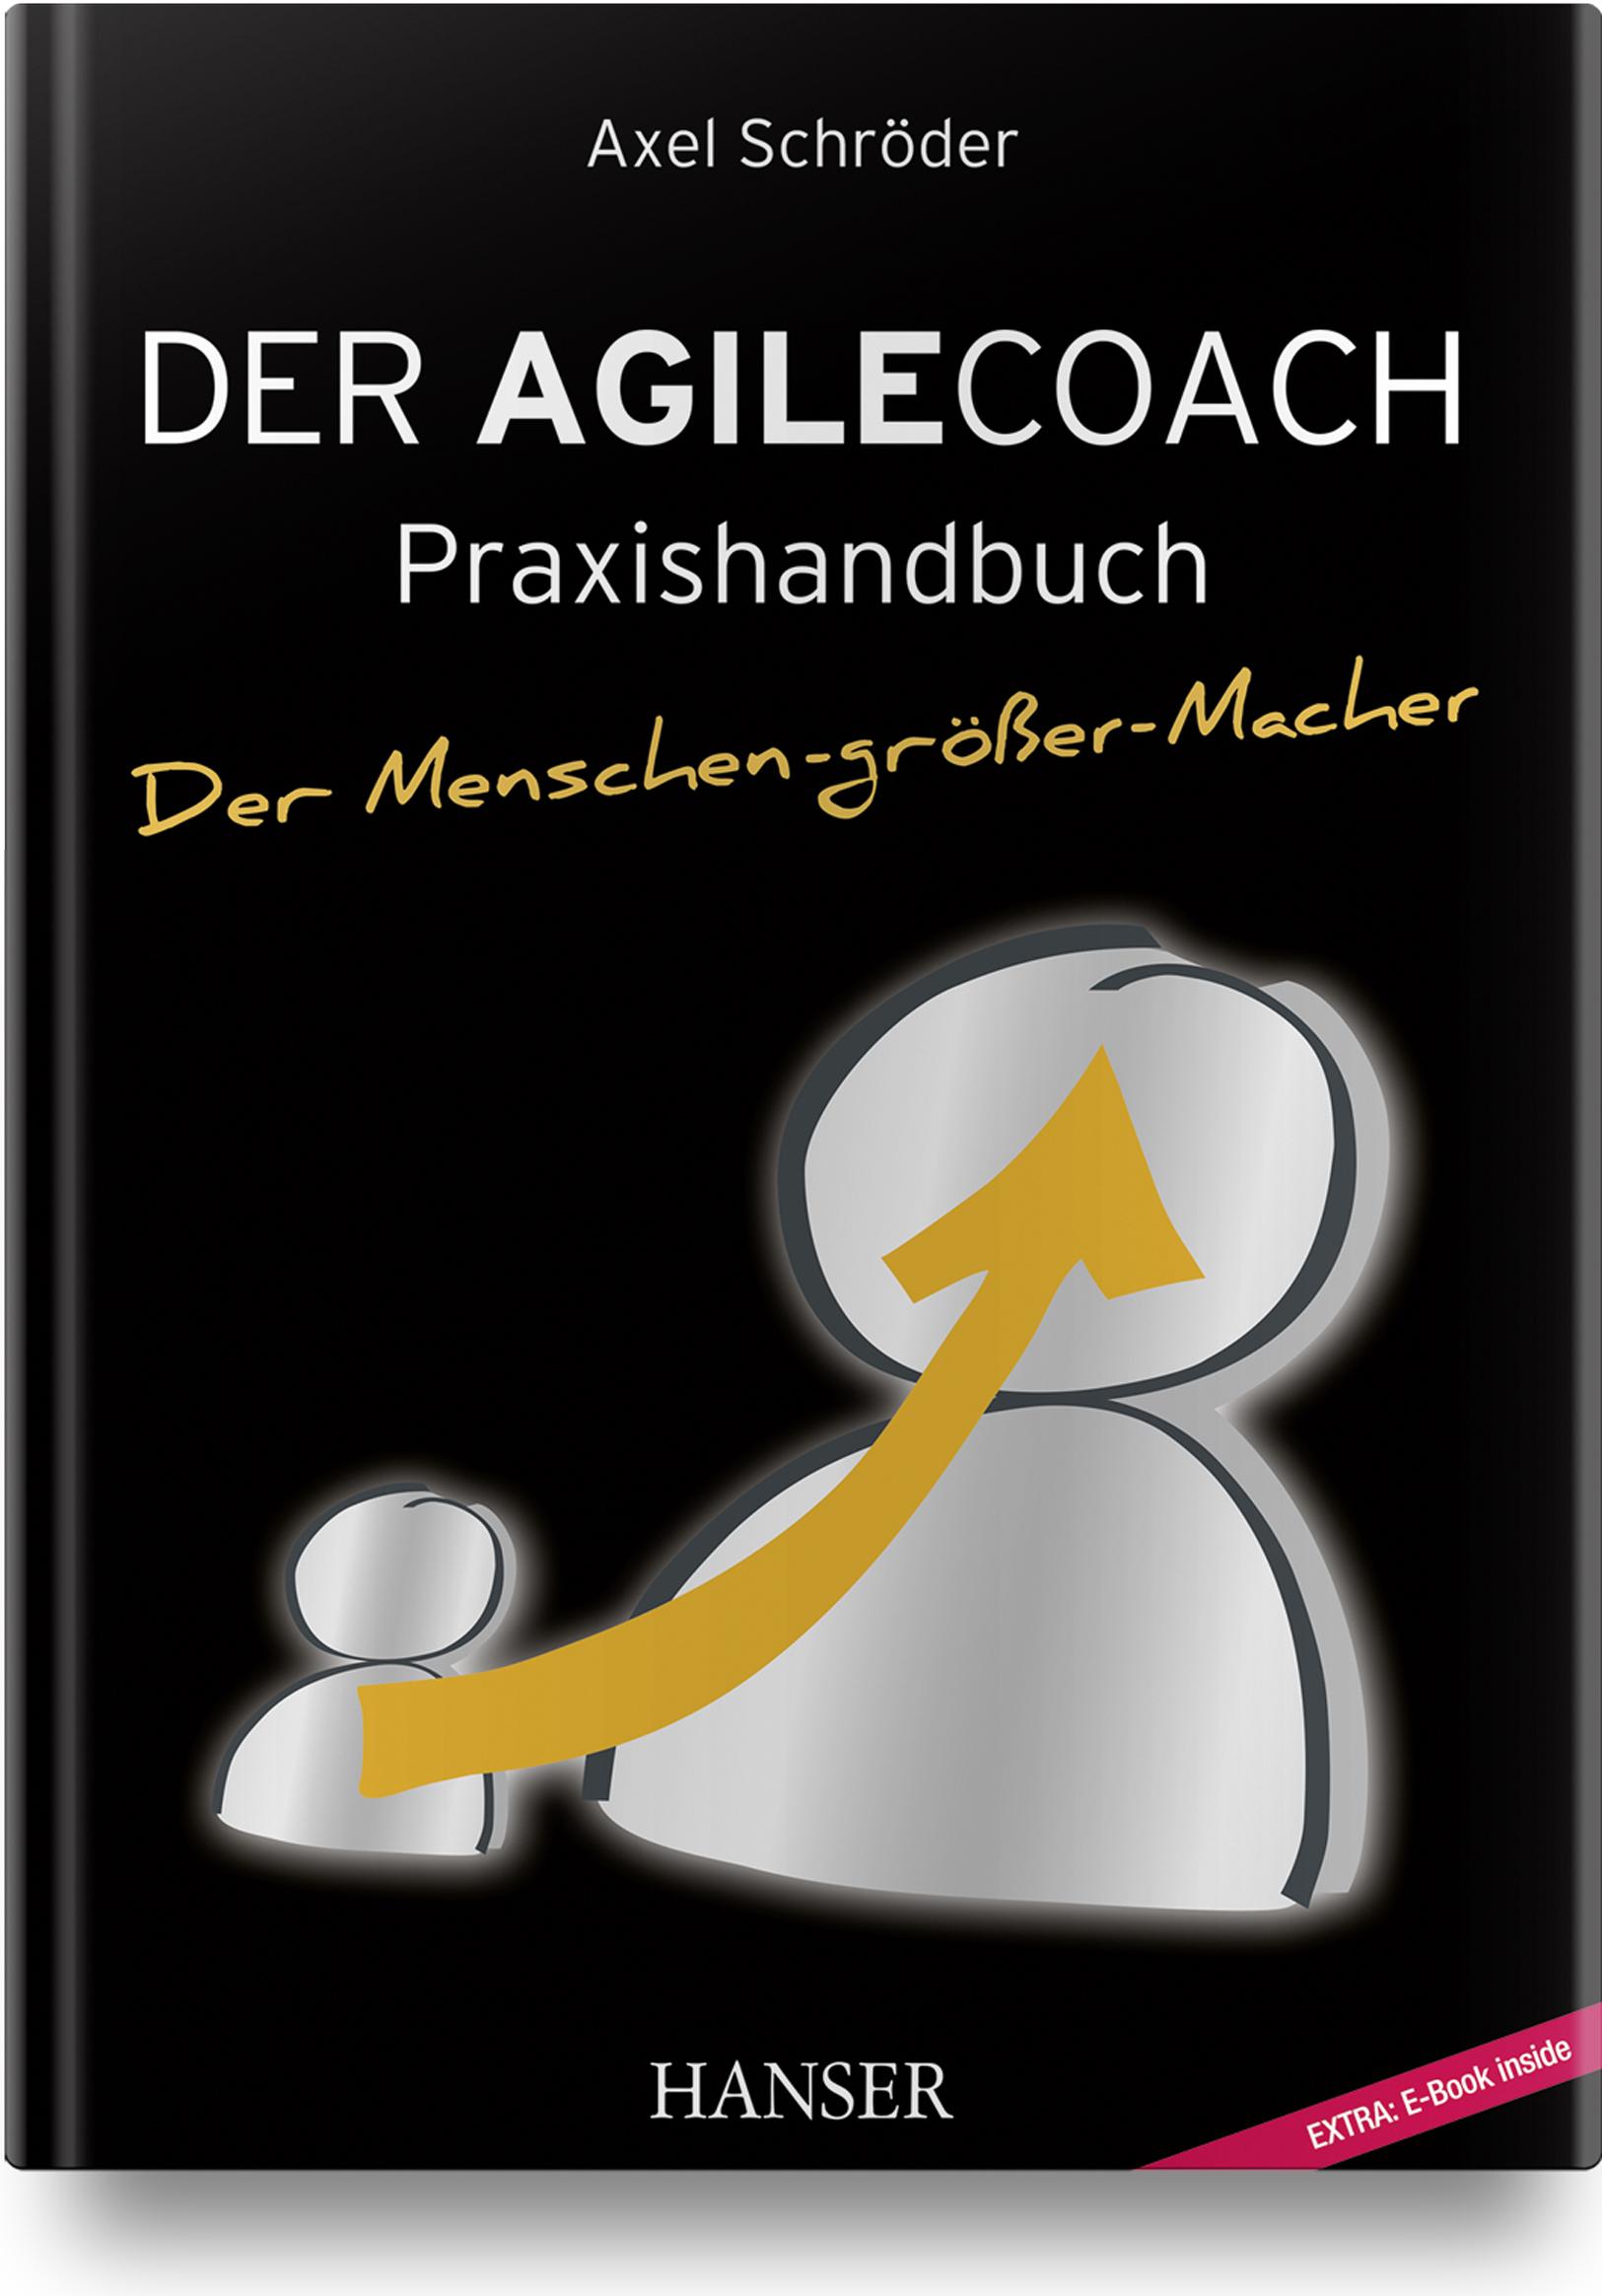 Der Agile Coach, 978-3-446-45682-2